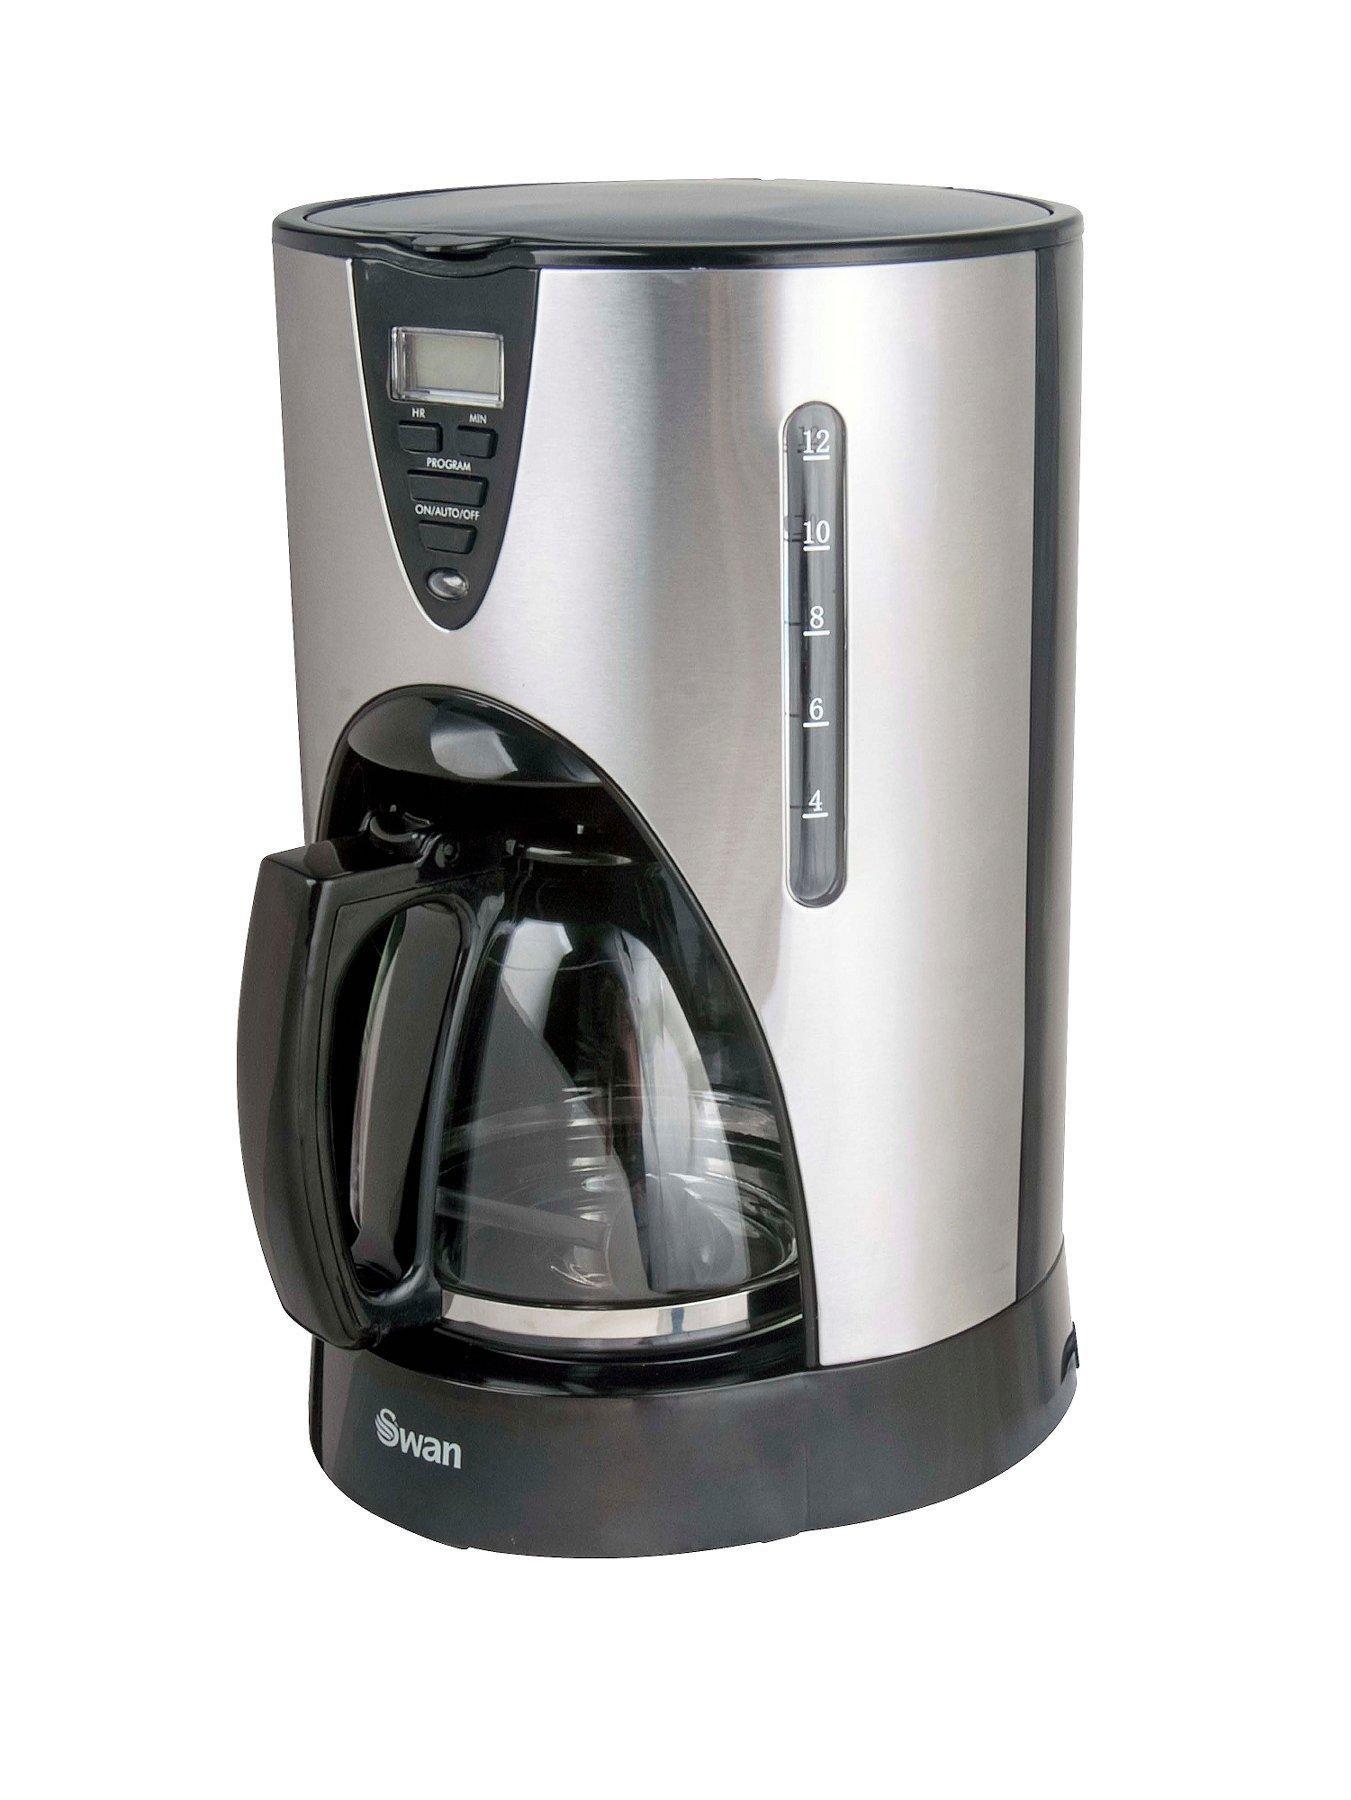 Swan SK13140 Filter Coffee Maker - Stainless Steel - now £16.99 @ Very